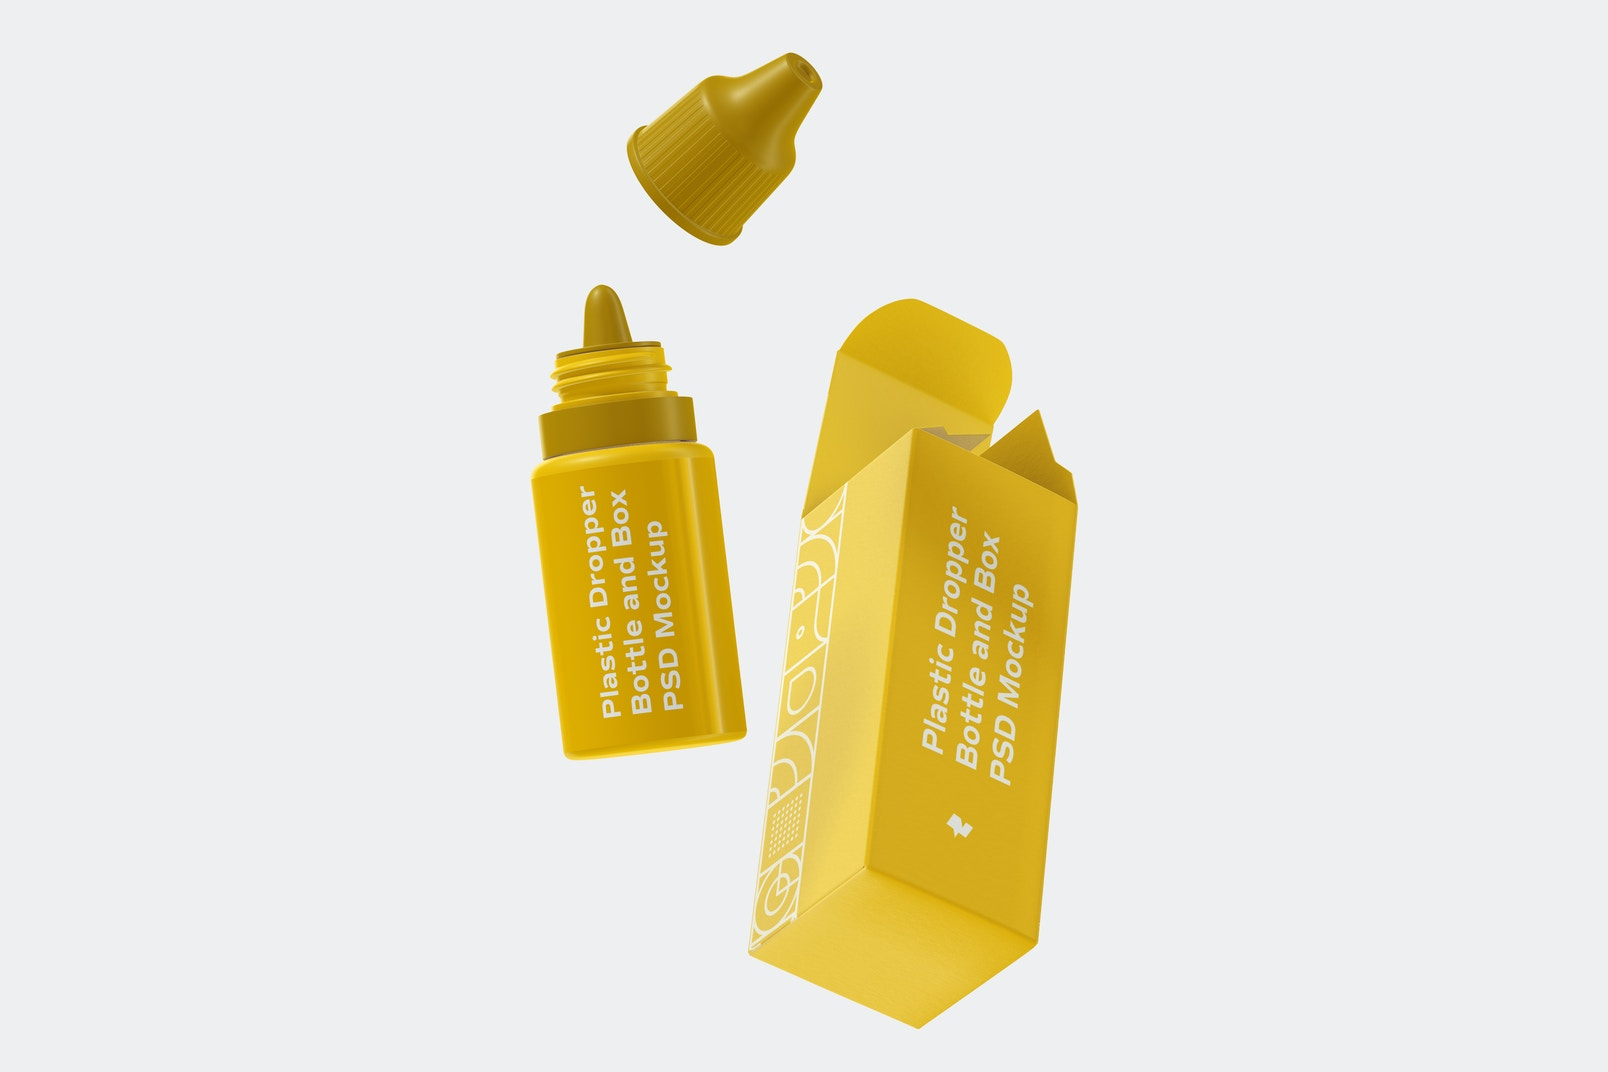 Plastic Dropper Bottle and Box Mockup, Floating